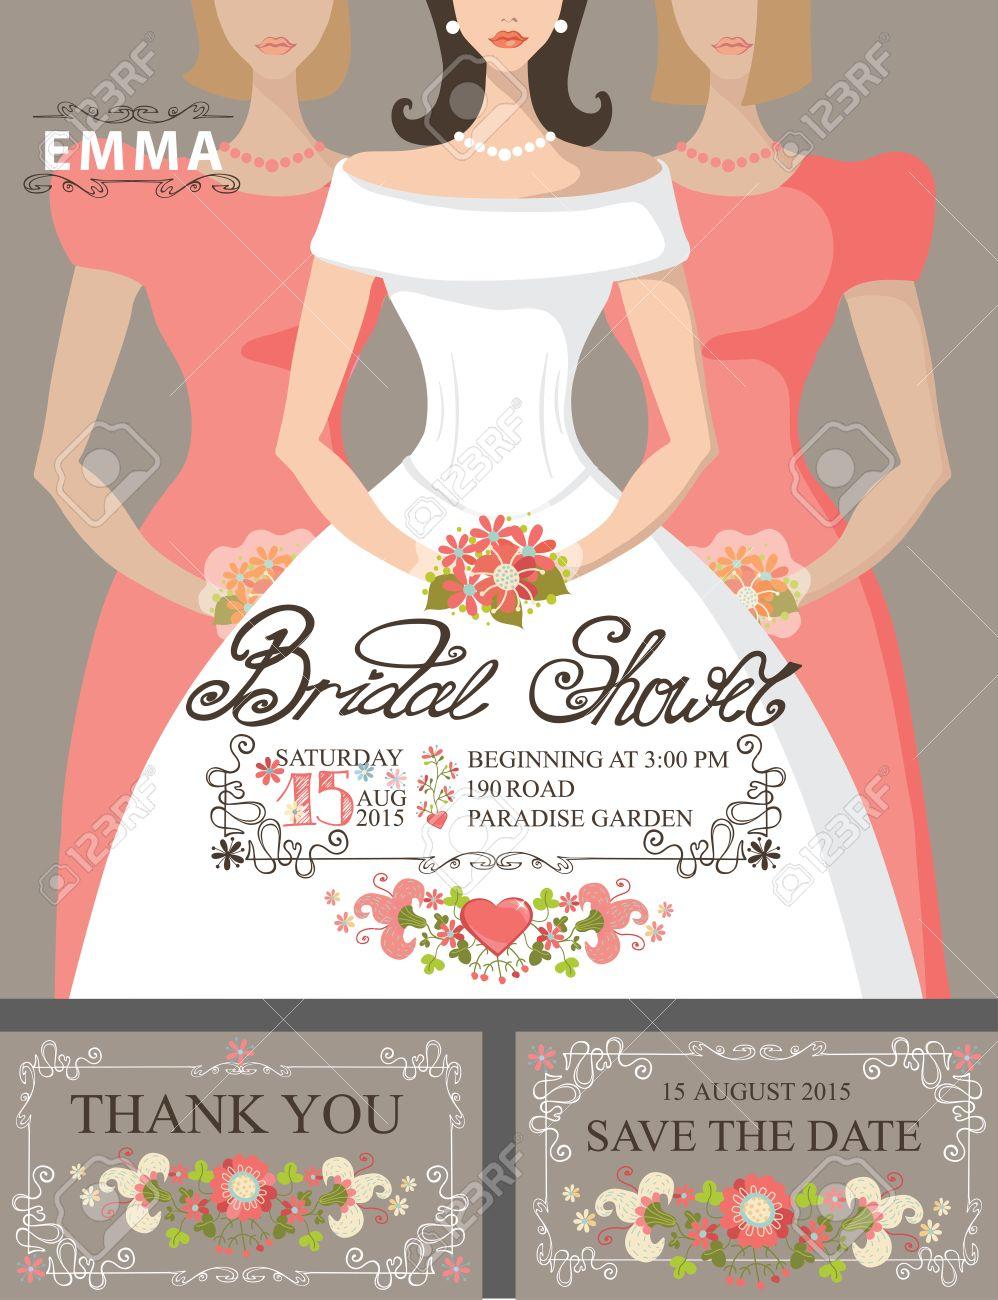 bridal shower invitation setbridebridesmaidsfloral decor stock vector 36296888